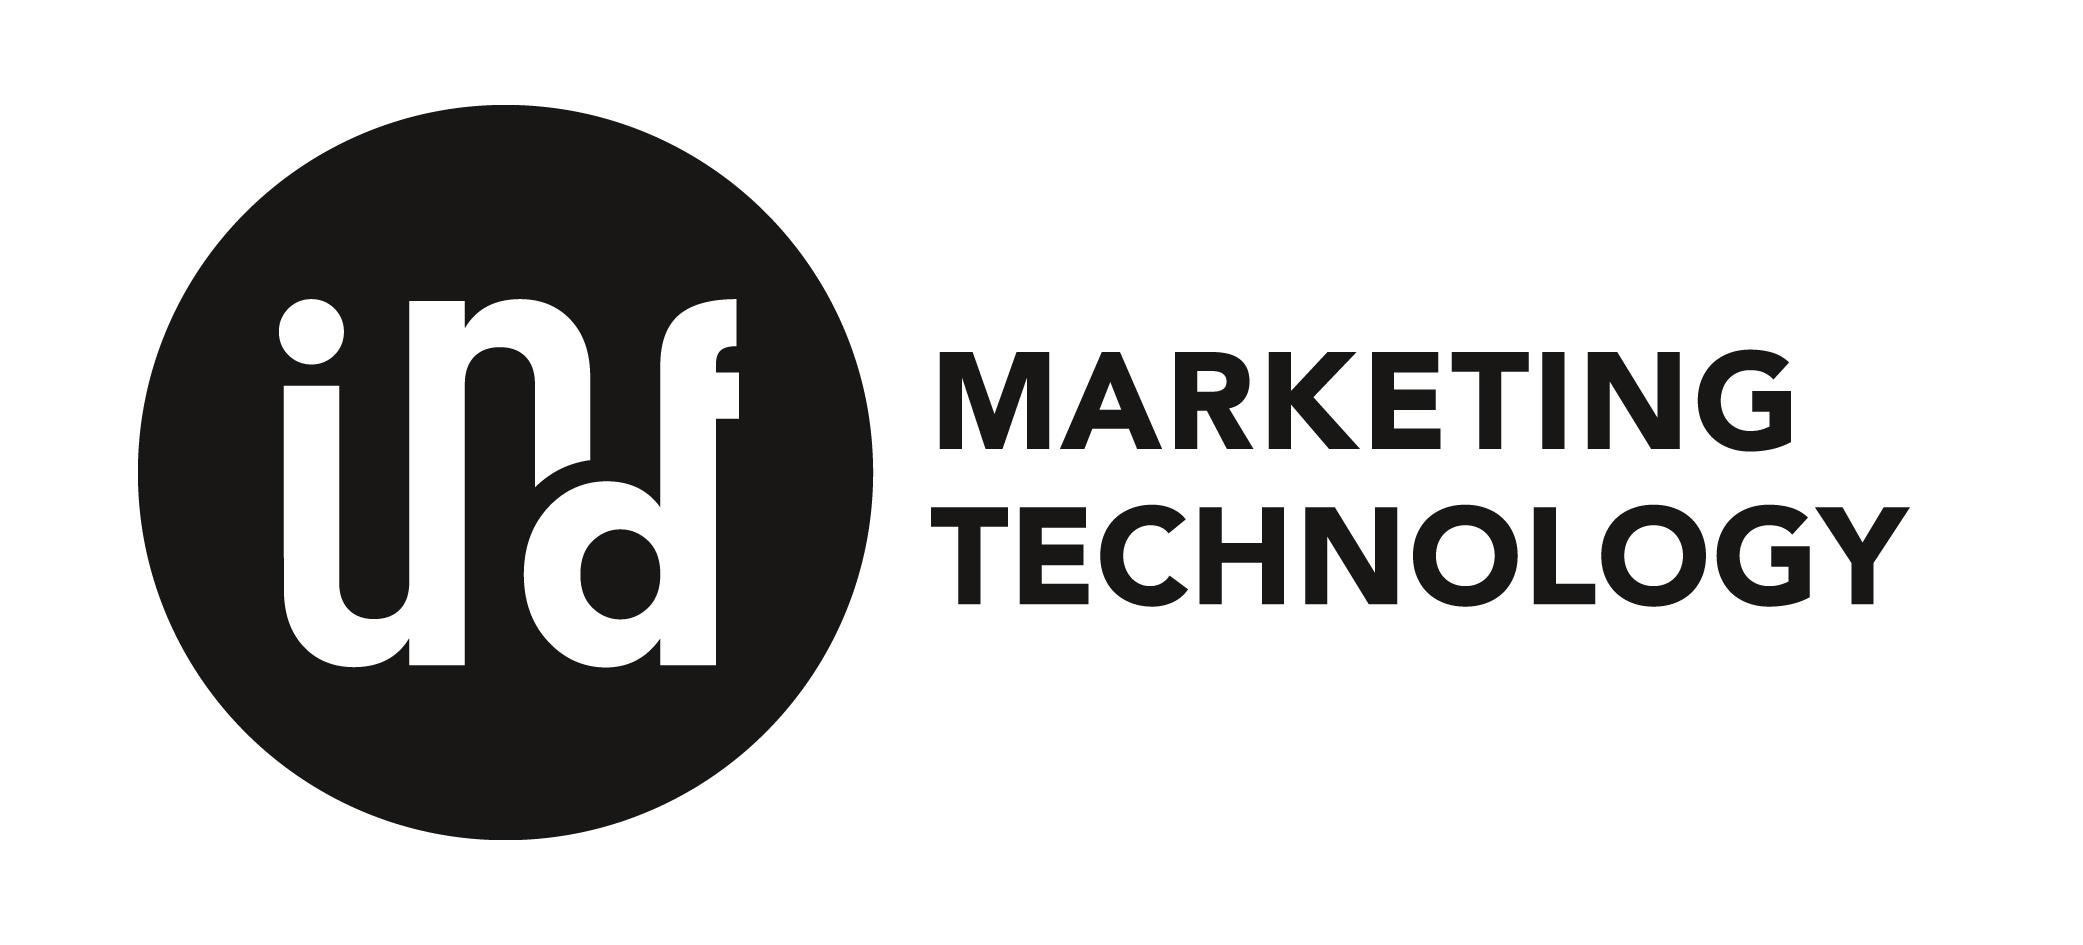 IundFM_Technology_Logo_def